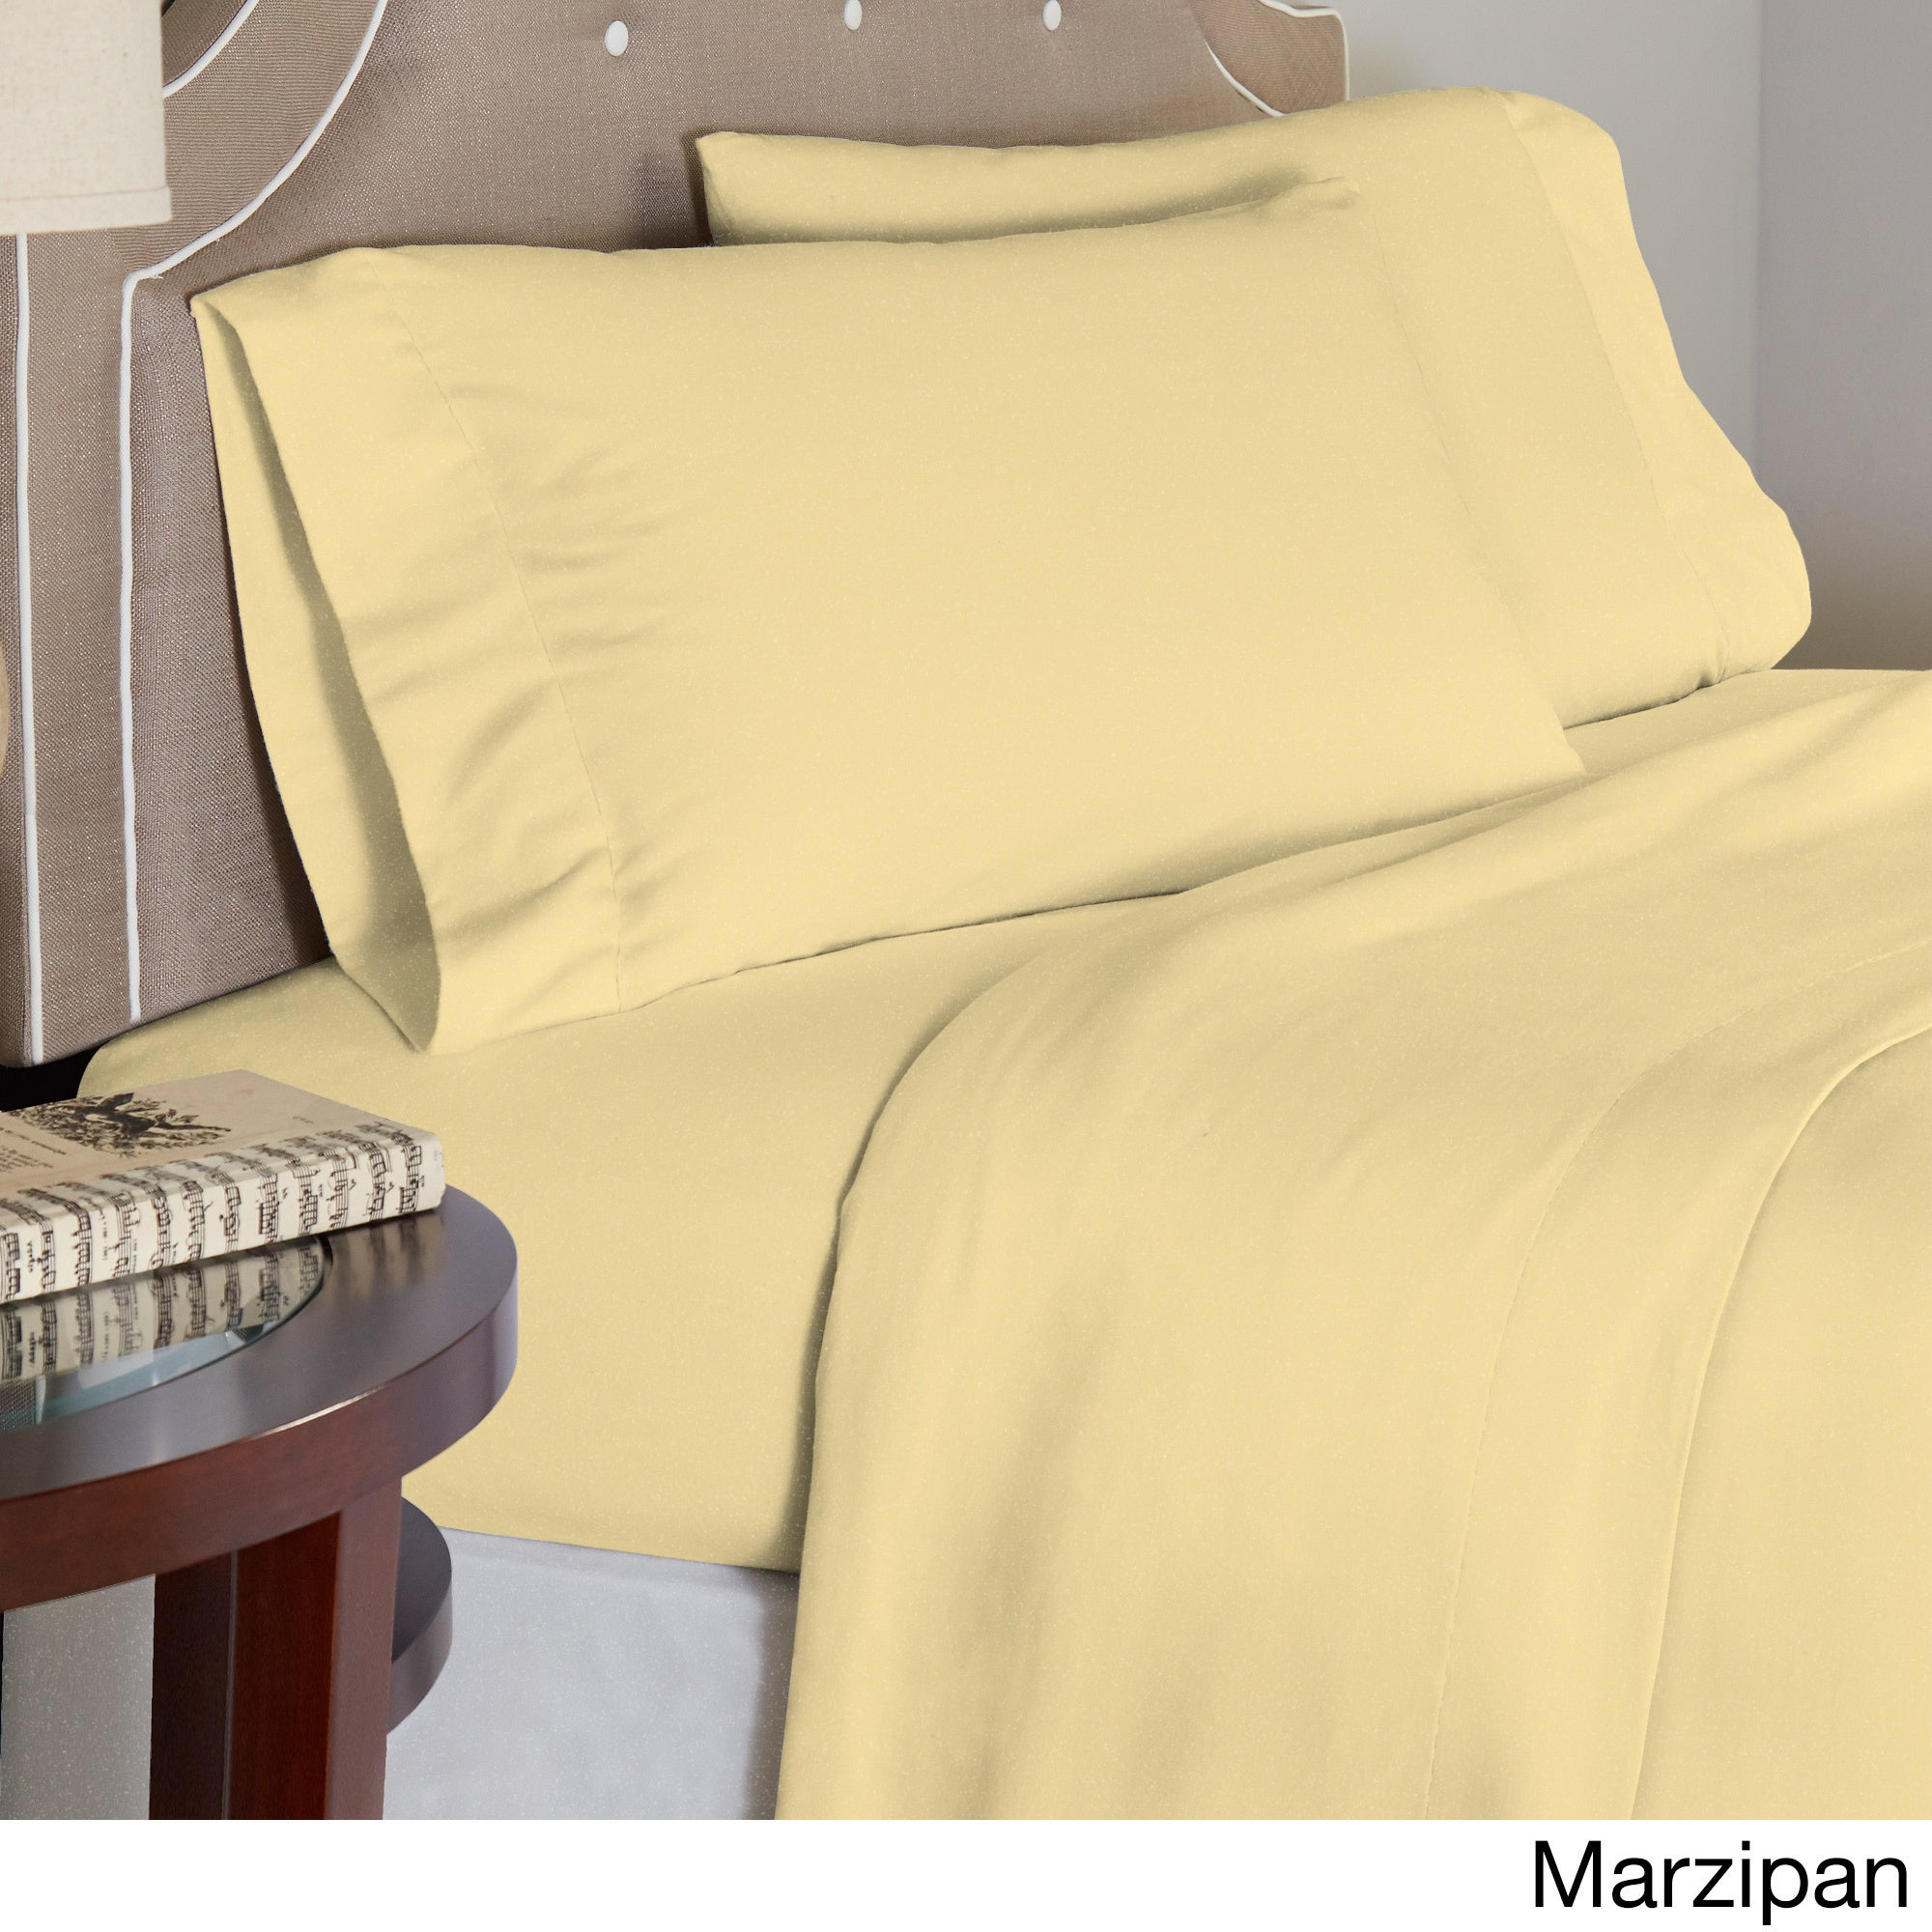 Size King Yellow Fashion Bedding | Shop our Best Bedding & Bath ...